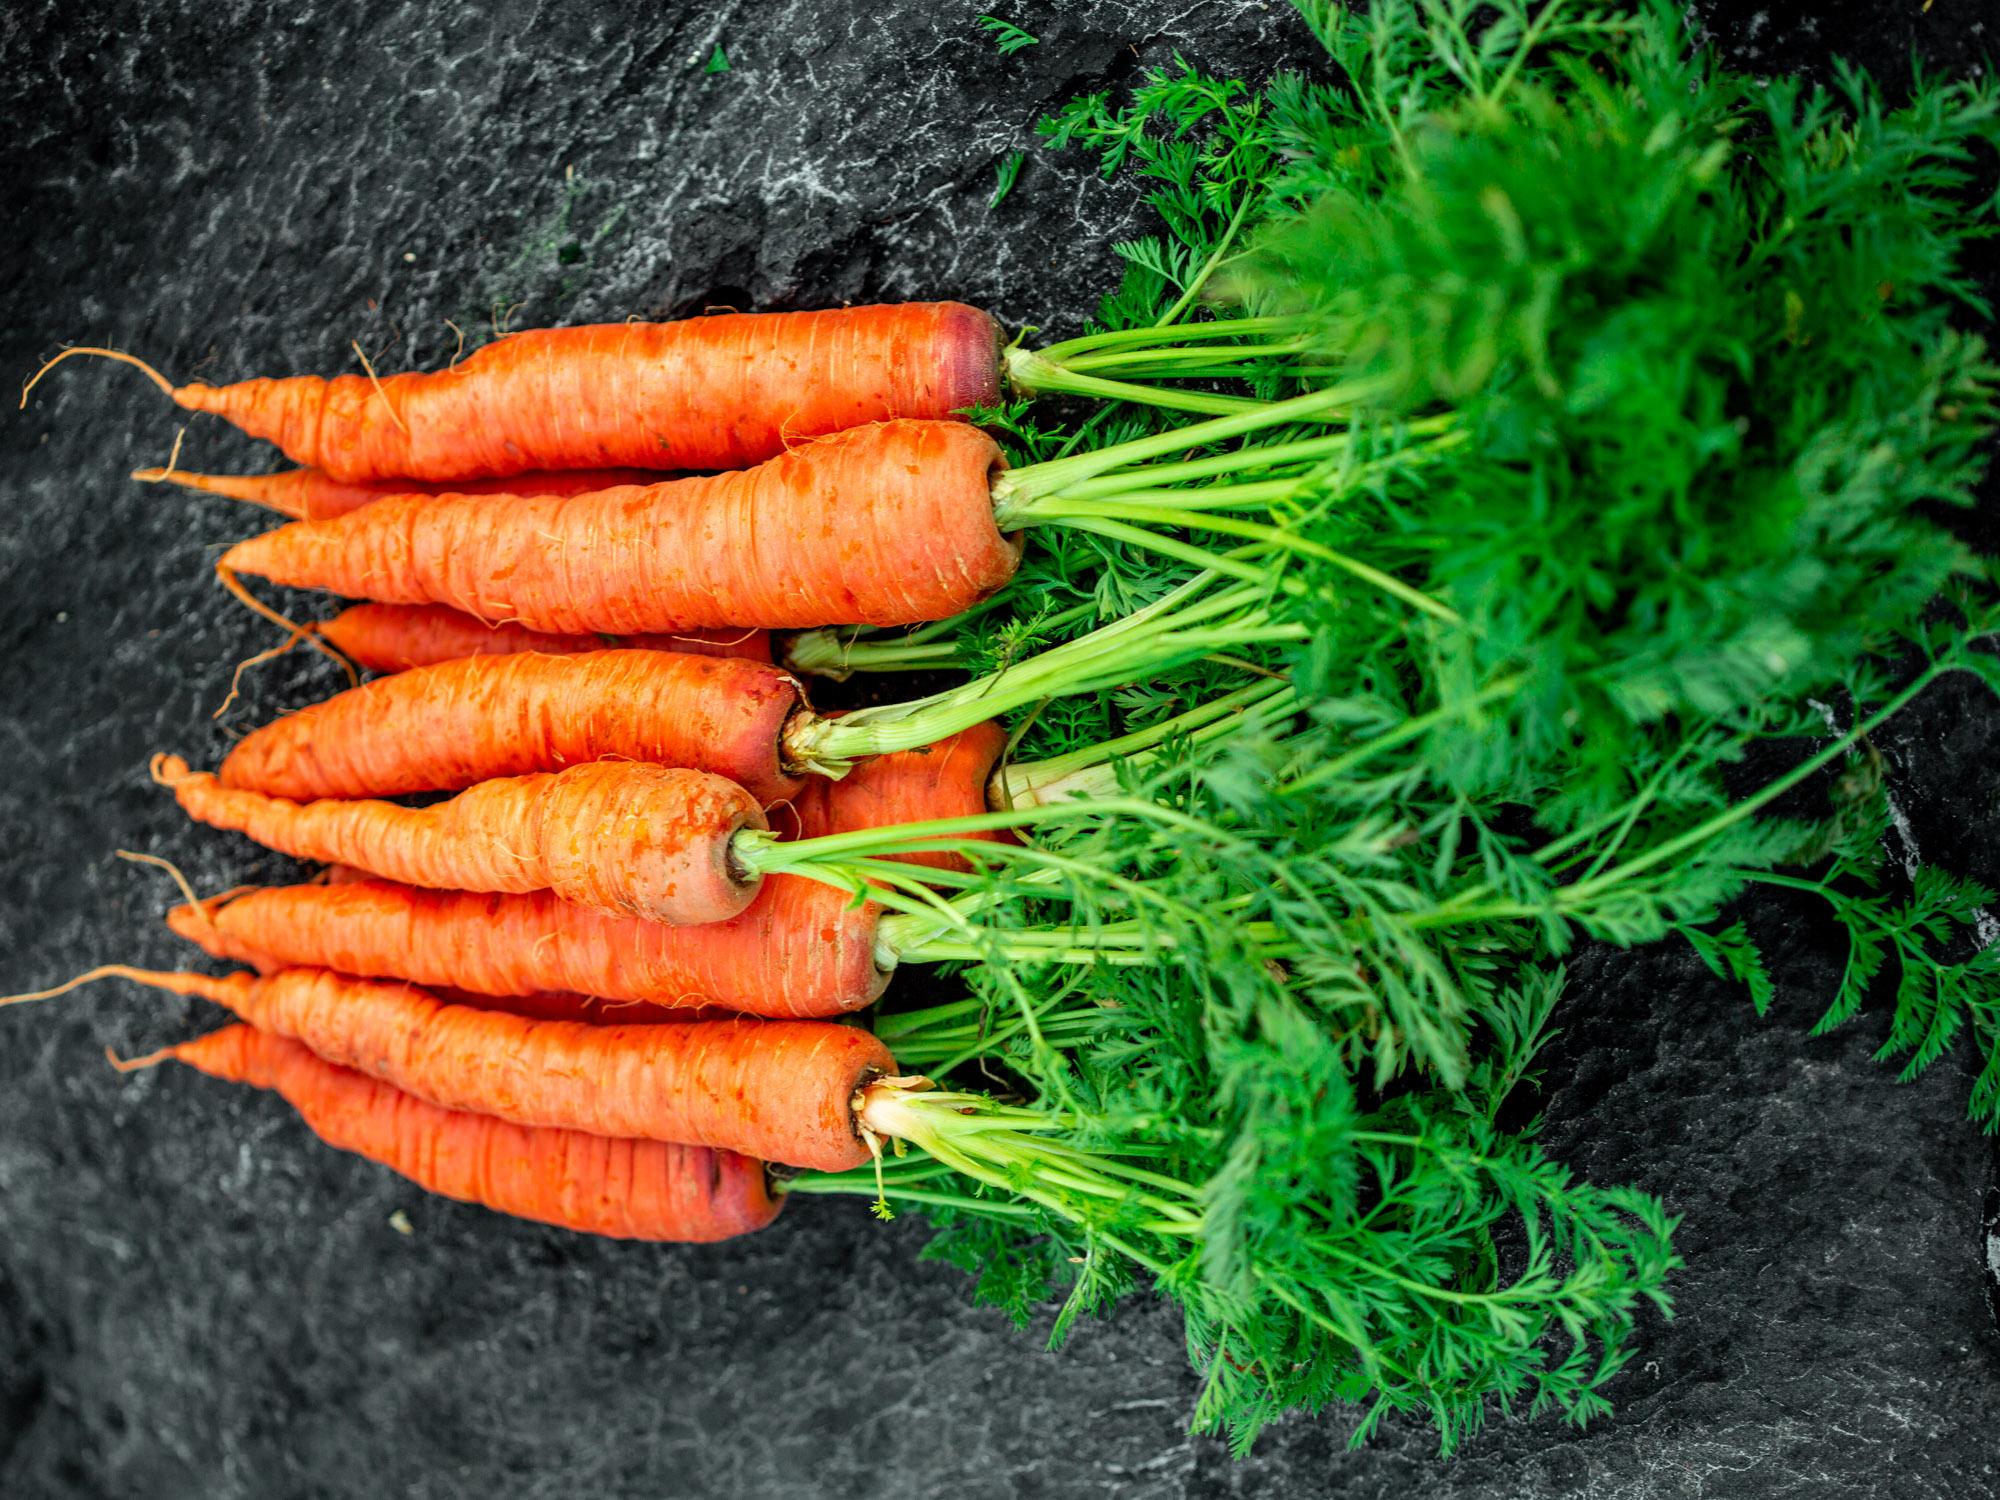 Knackig frisch. Vegane Rohkost Rezepte mit Karotten.